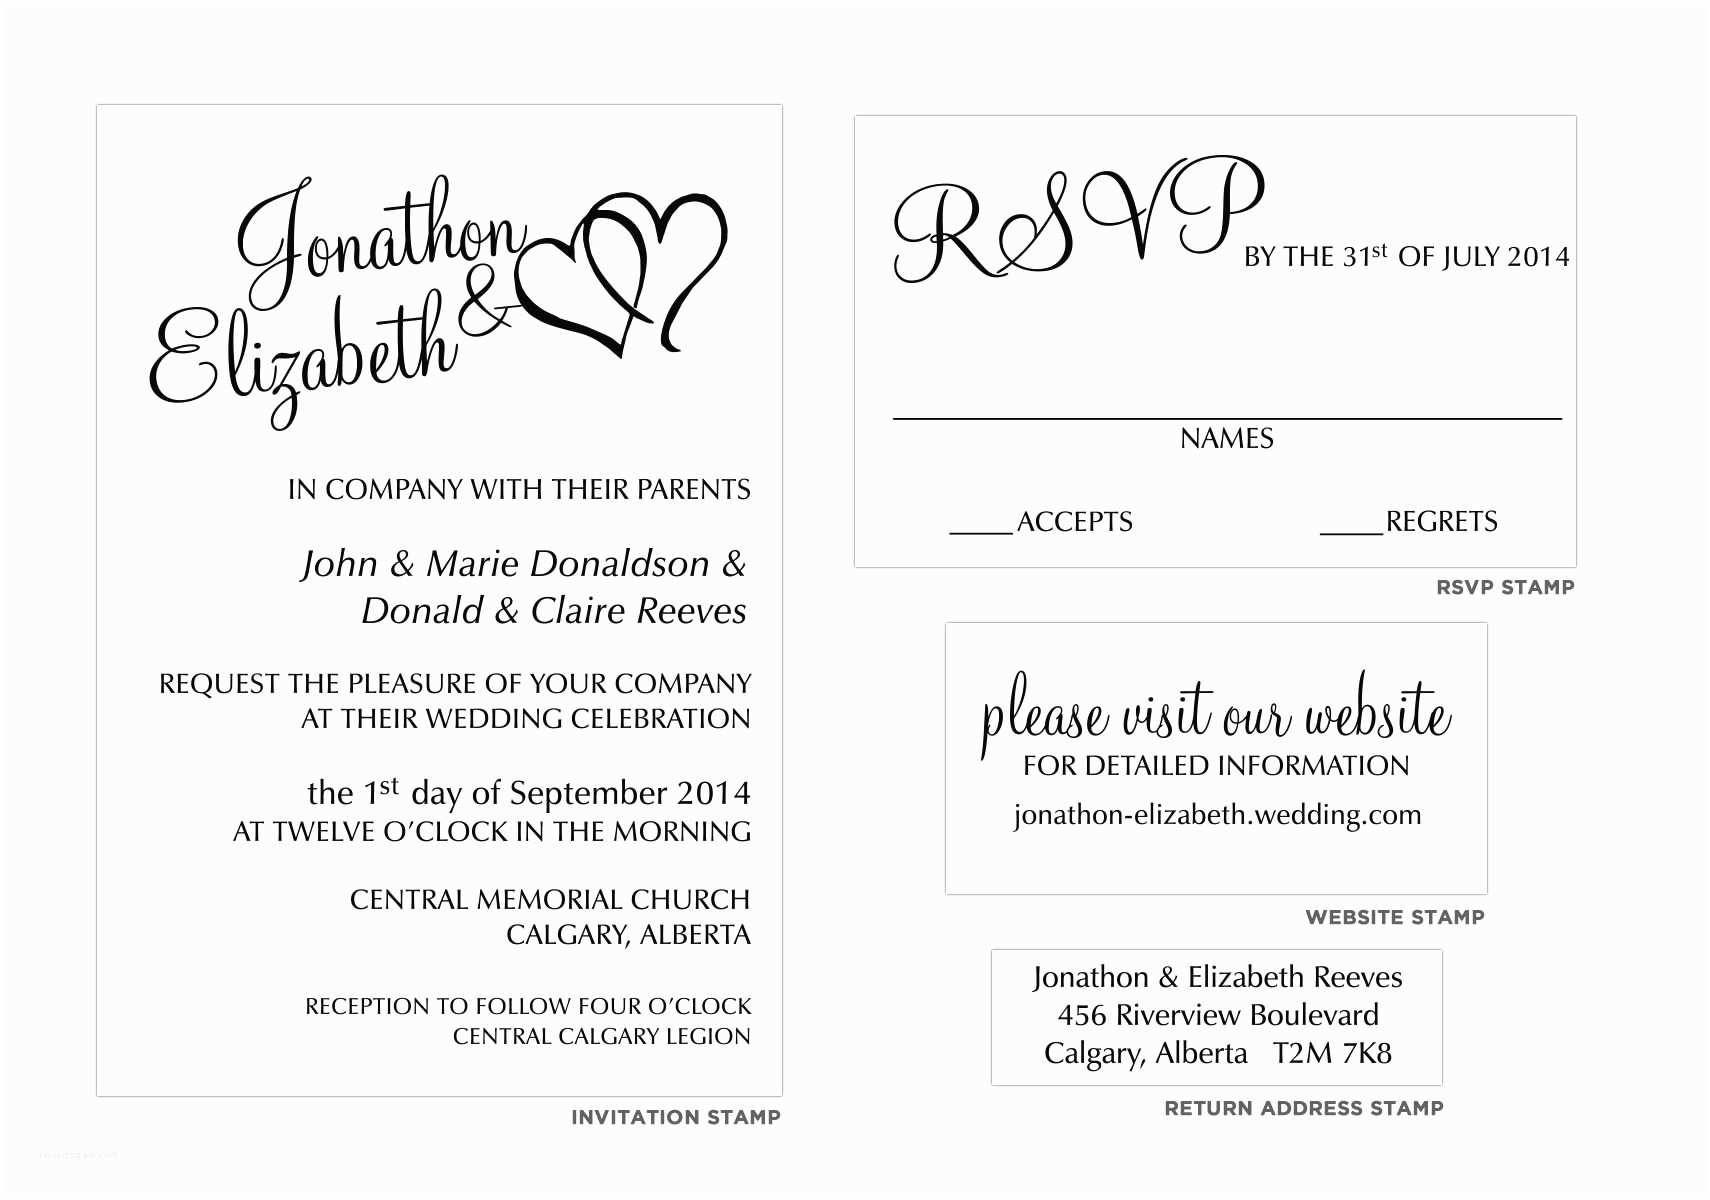 Reject Wedding Invitation Politely Sample Wedding Invitation Templates How to Decline A Wedding